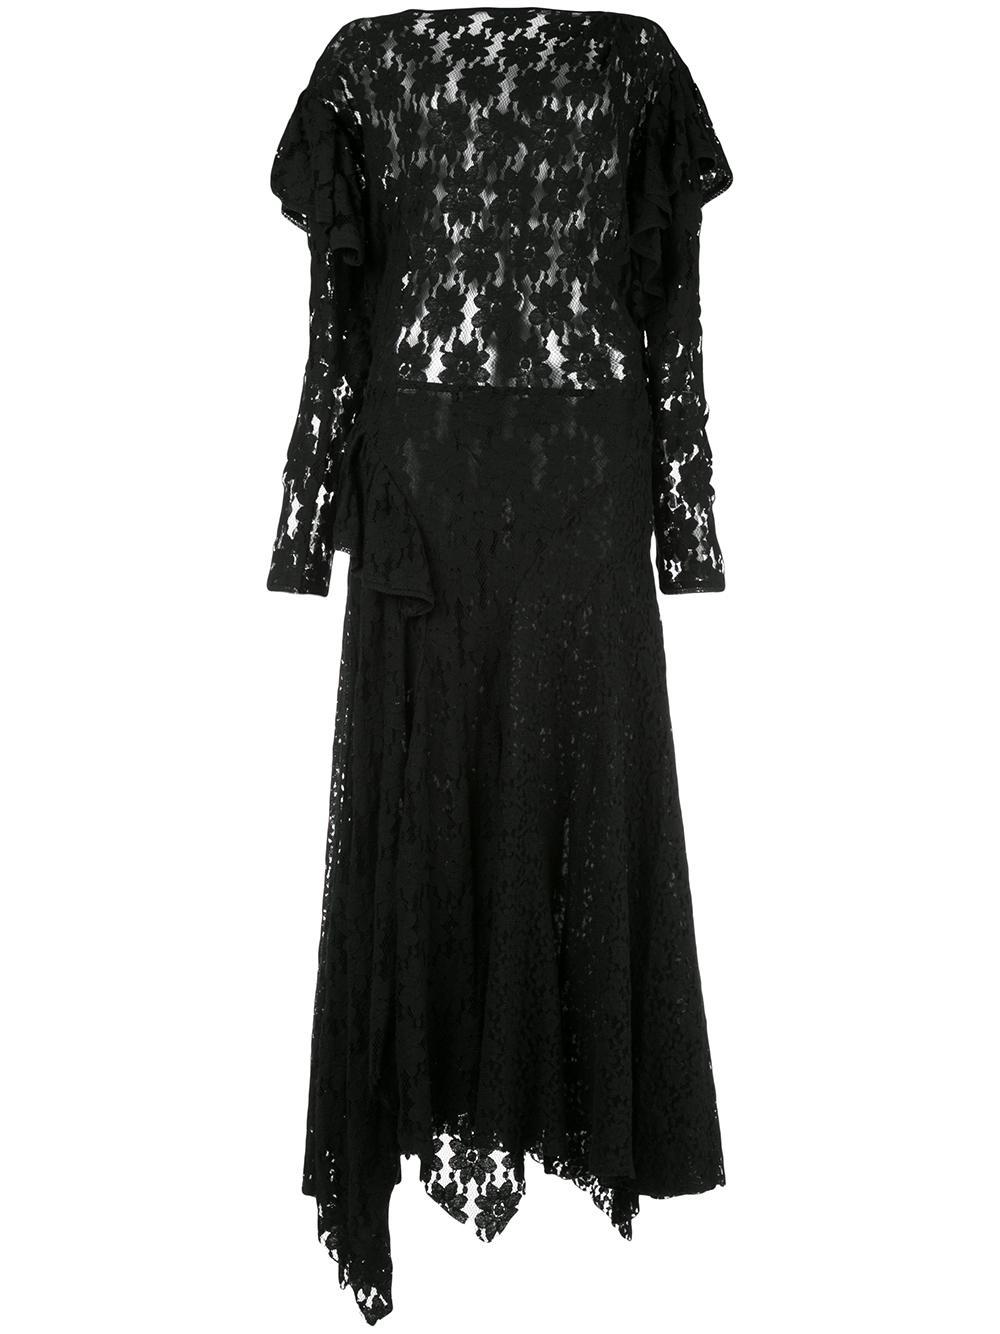 Long Sleeve Draped Lace Dress